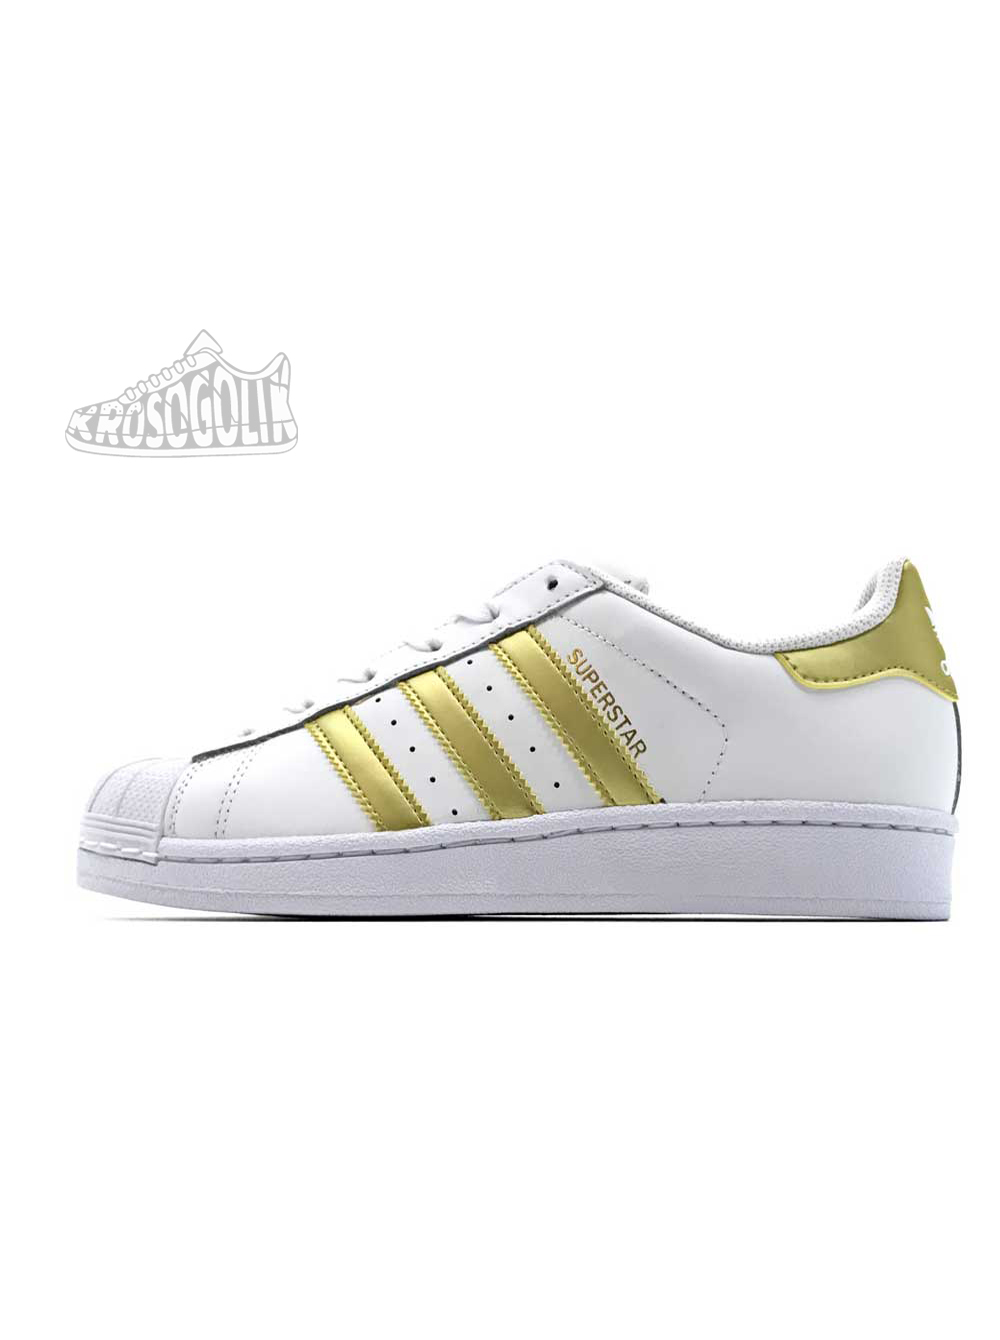 6c476ef1 Купить женские кроссовки Adidas Superstar II Women White Gold на ...